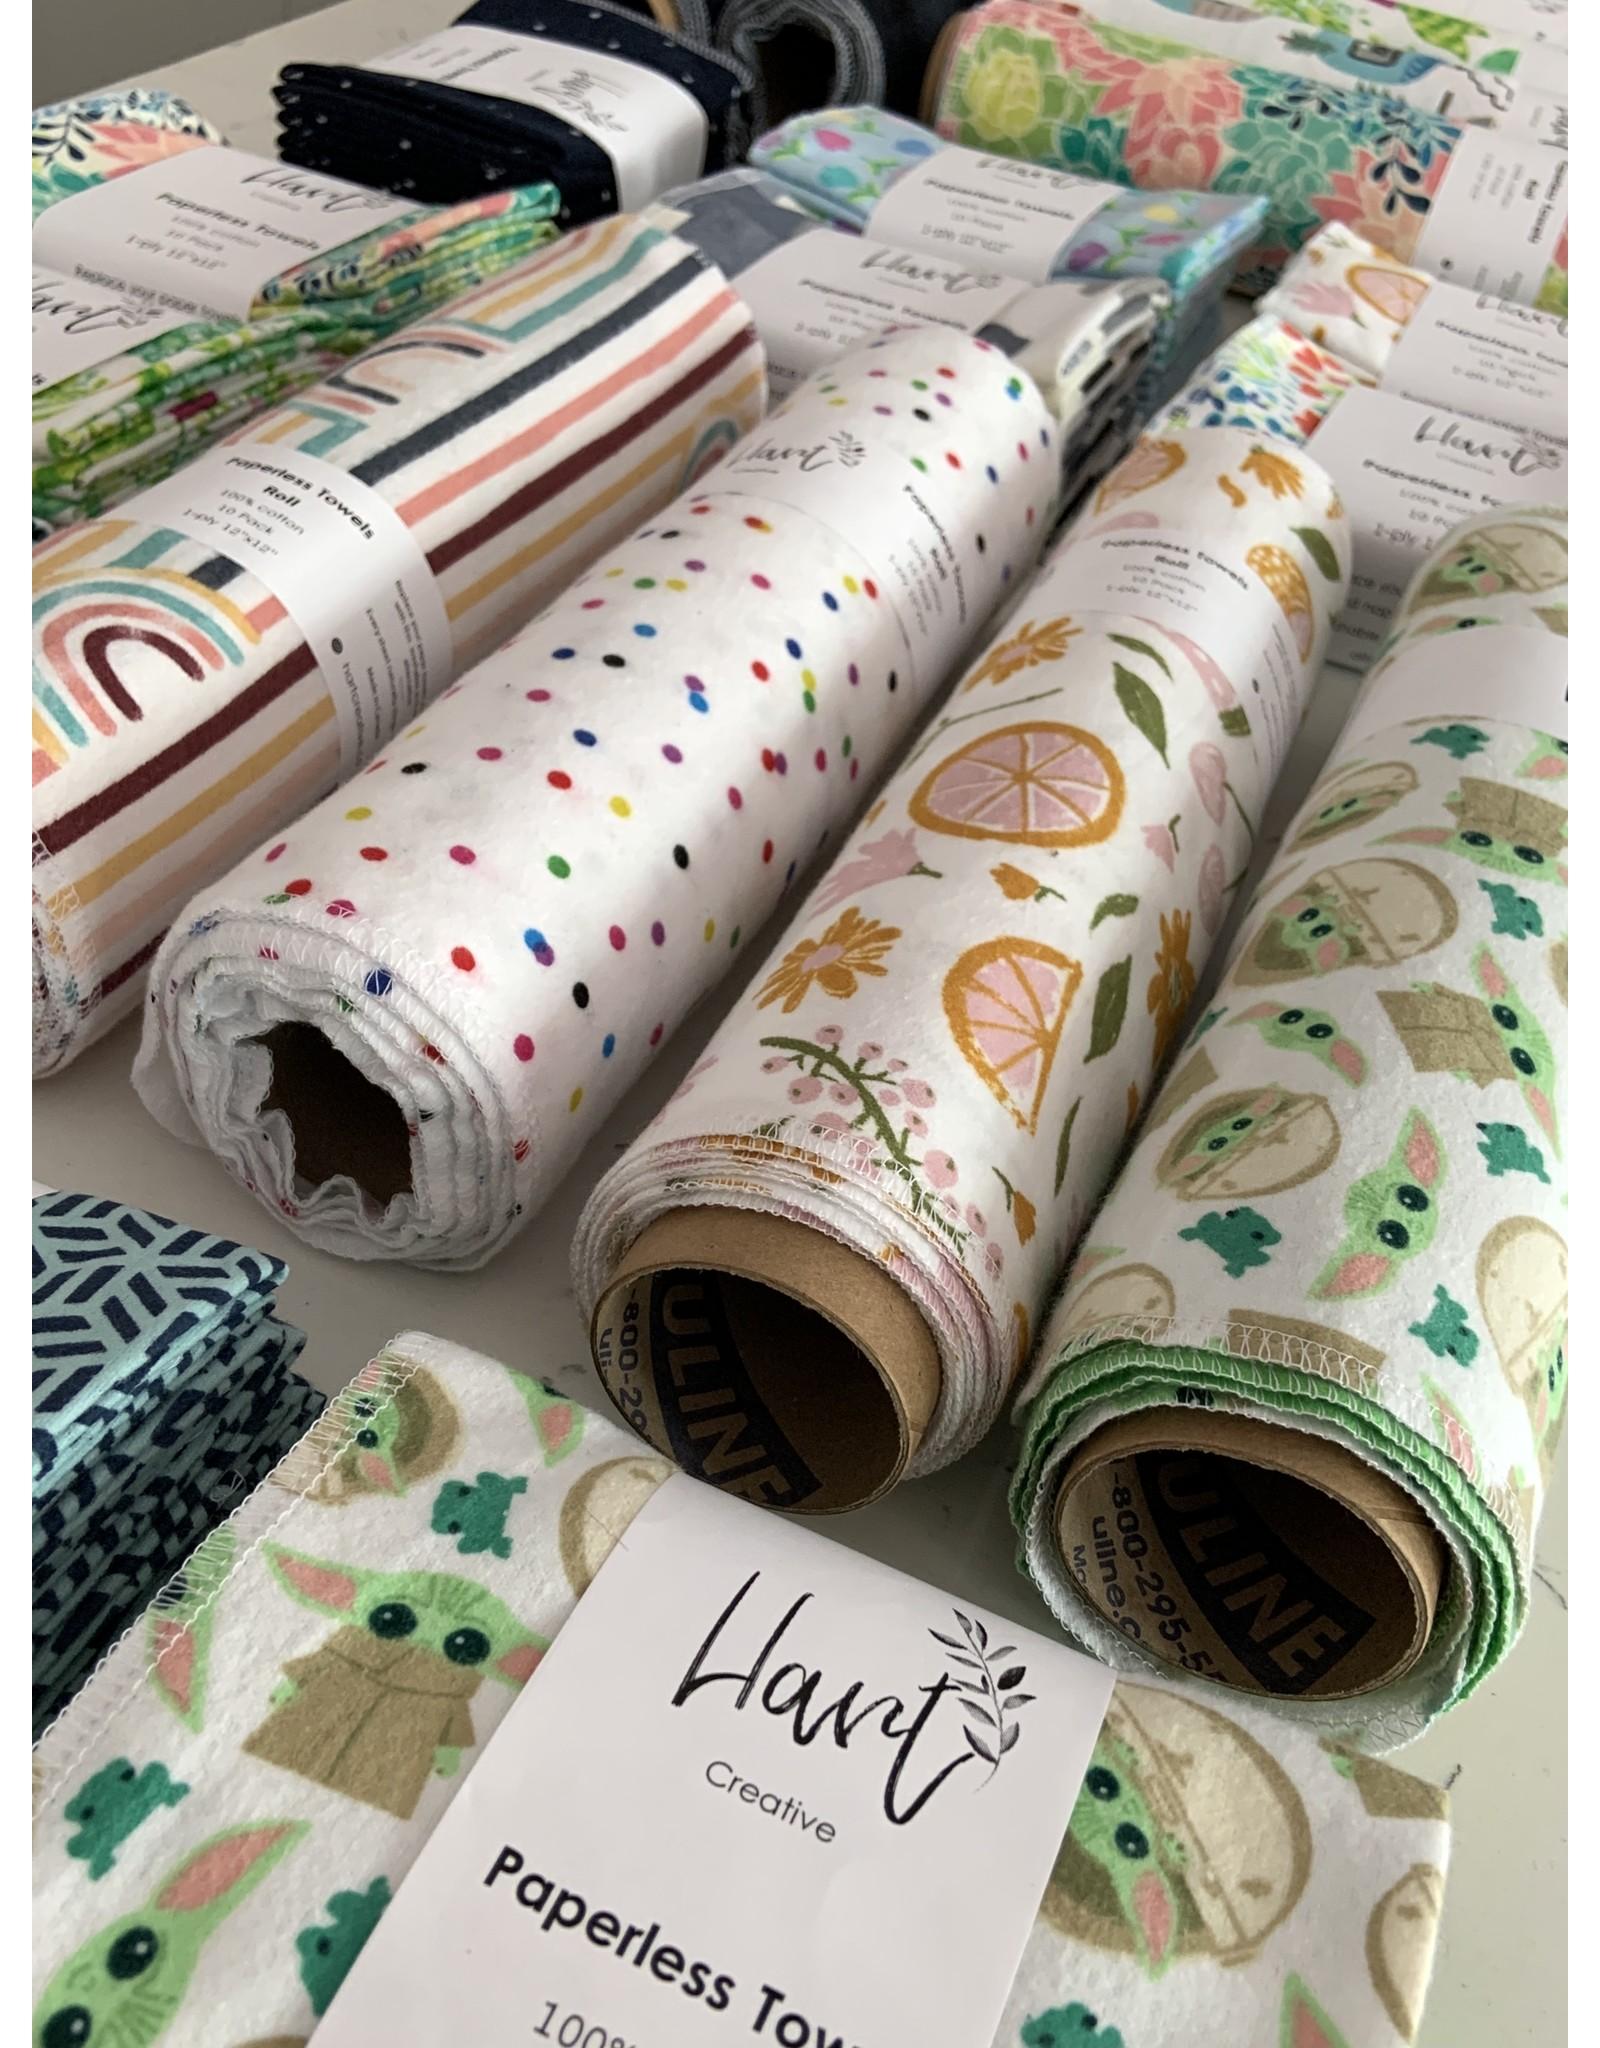 Hart Creative Co. Reusable Cloth Paperless Towels